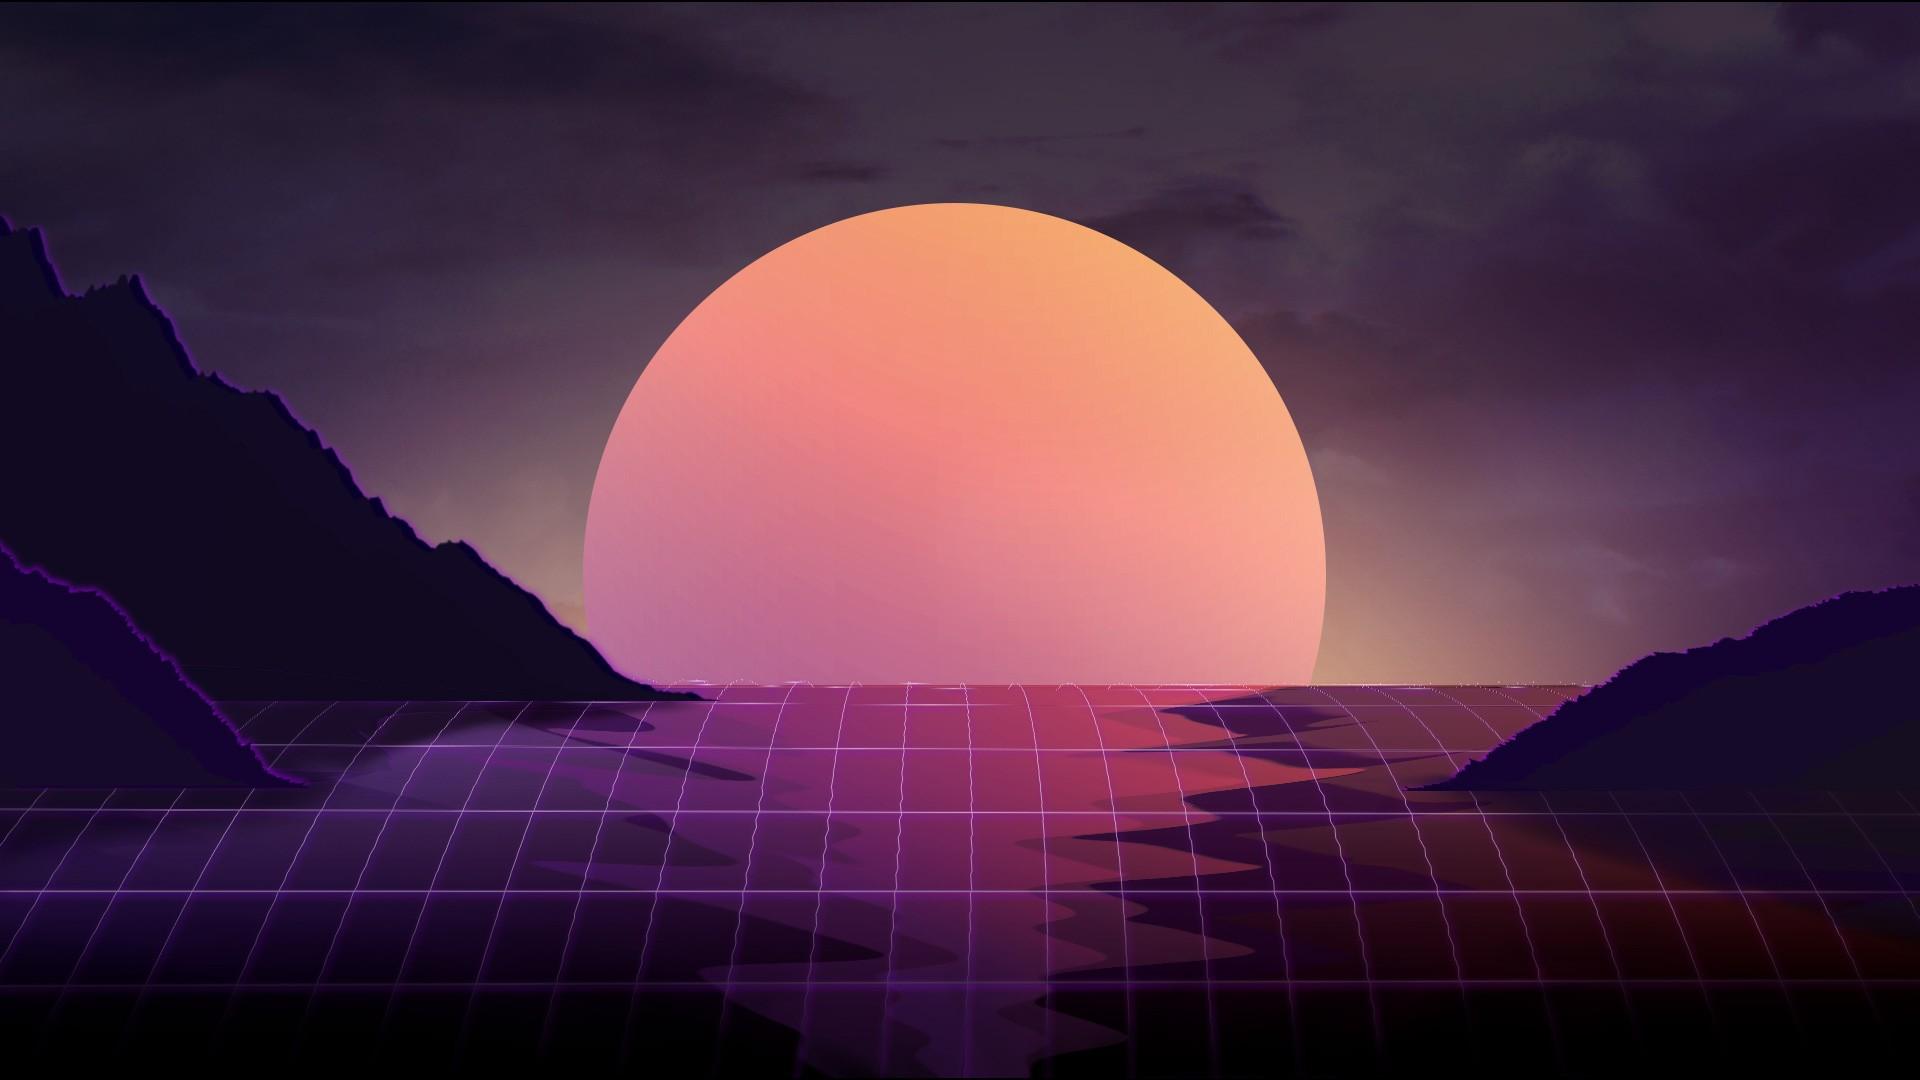 Retro Apple Wallpaper Iphone X Neon Sunset Hd Wallpapers Hd Wallpapers Id 22902